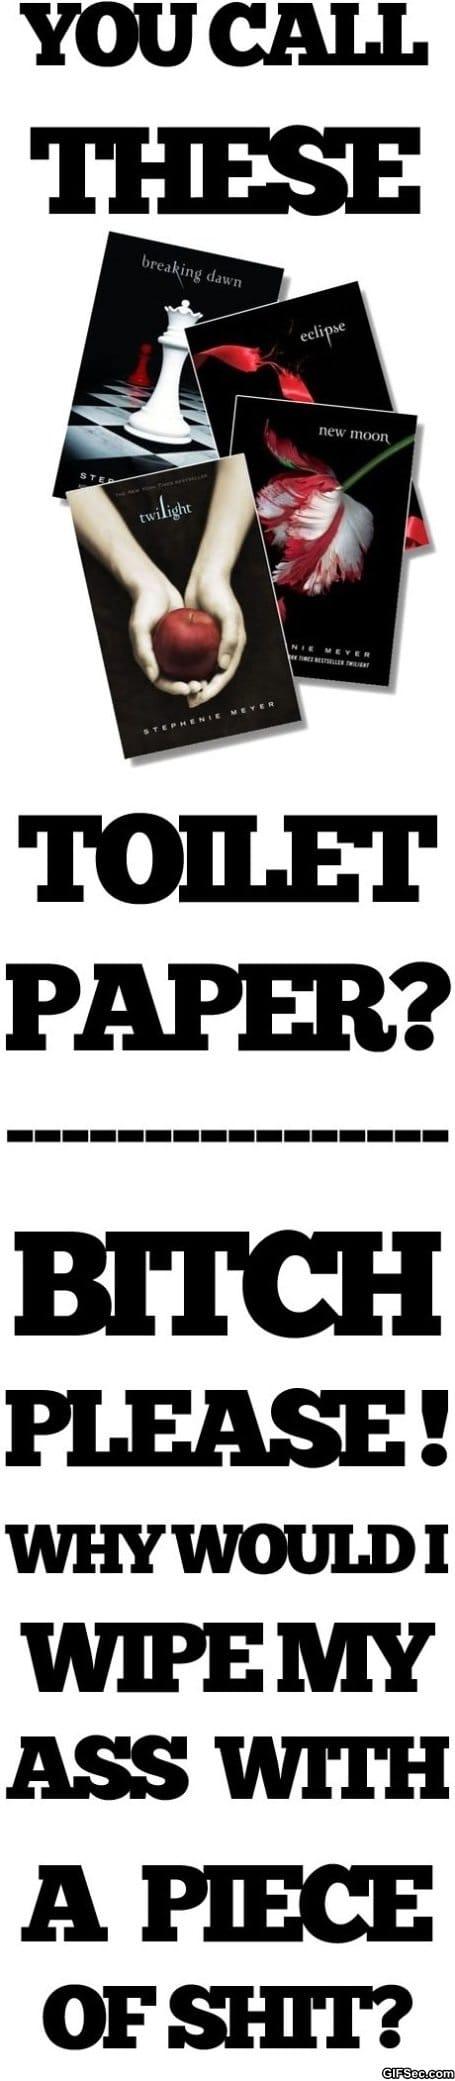 twilight-vs-toilet-paper